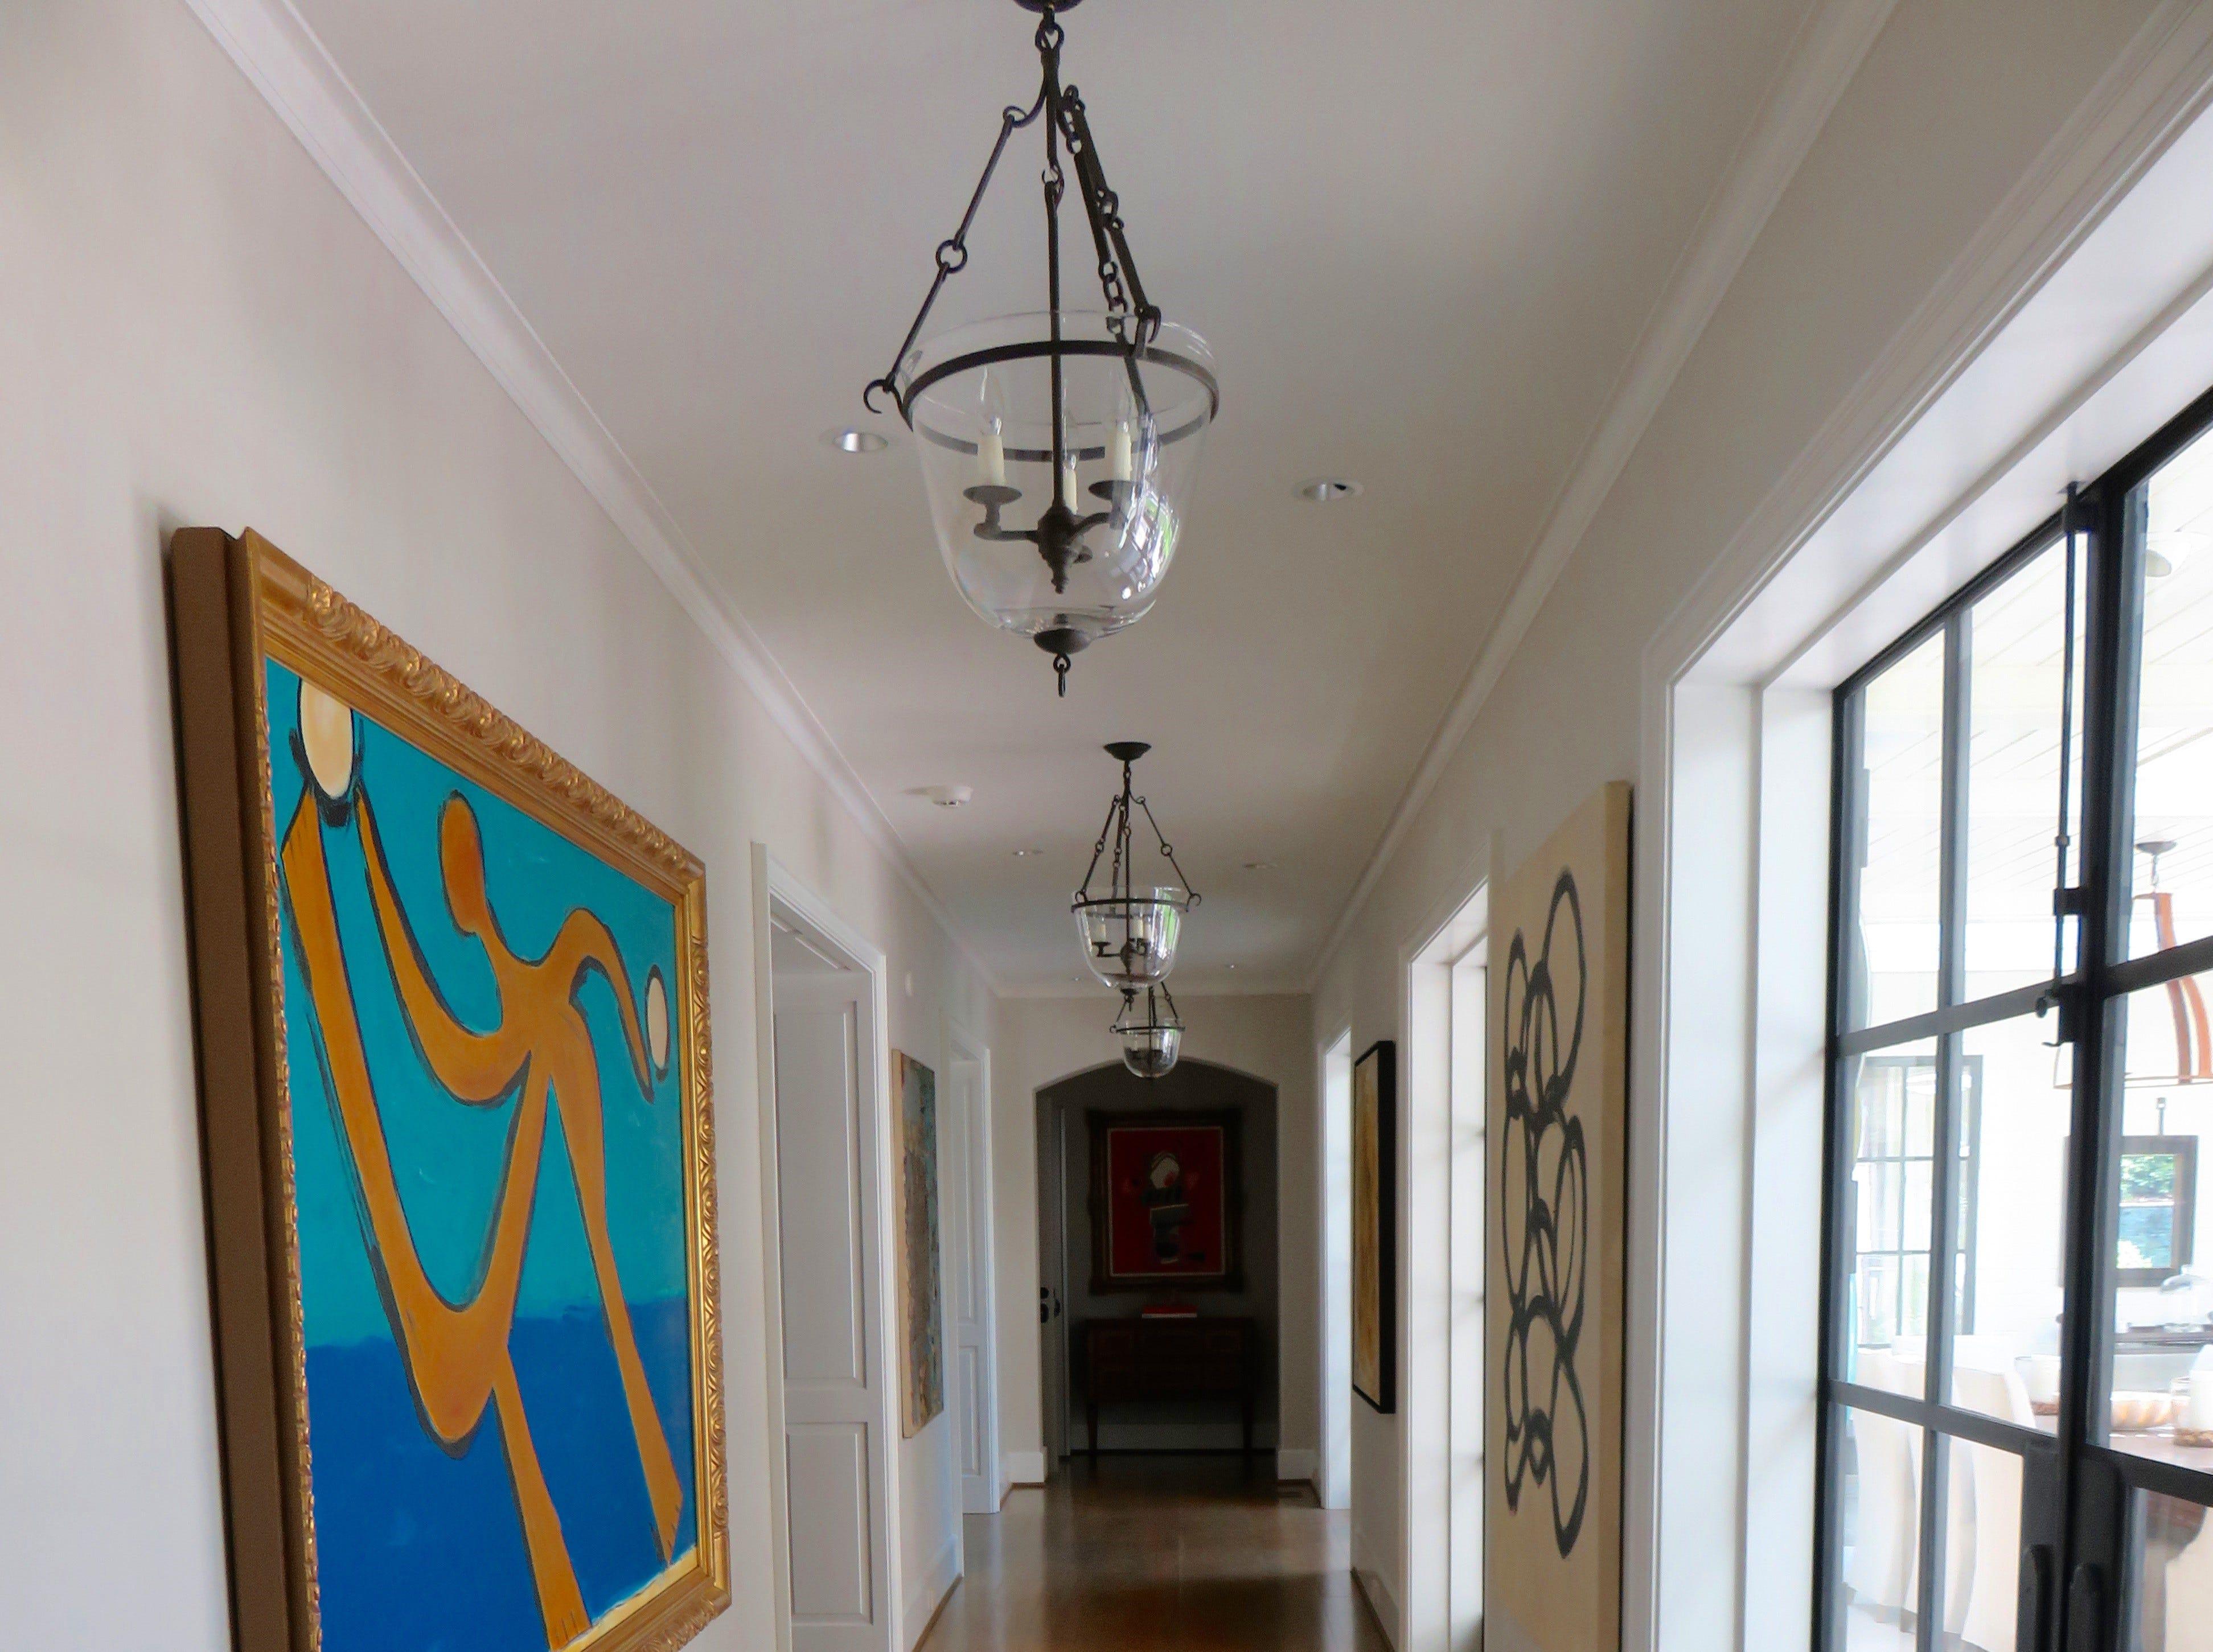 The gallery hallway leads to the veranda.